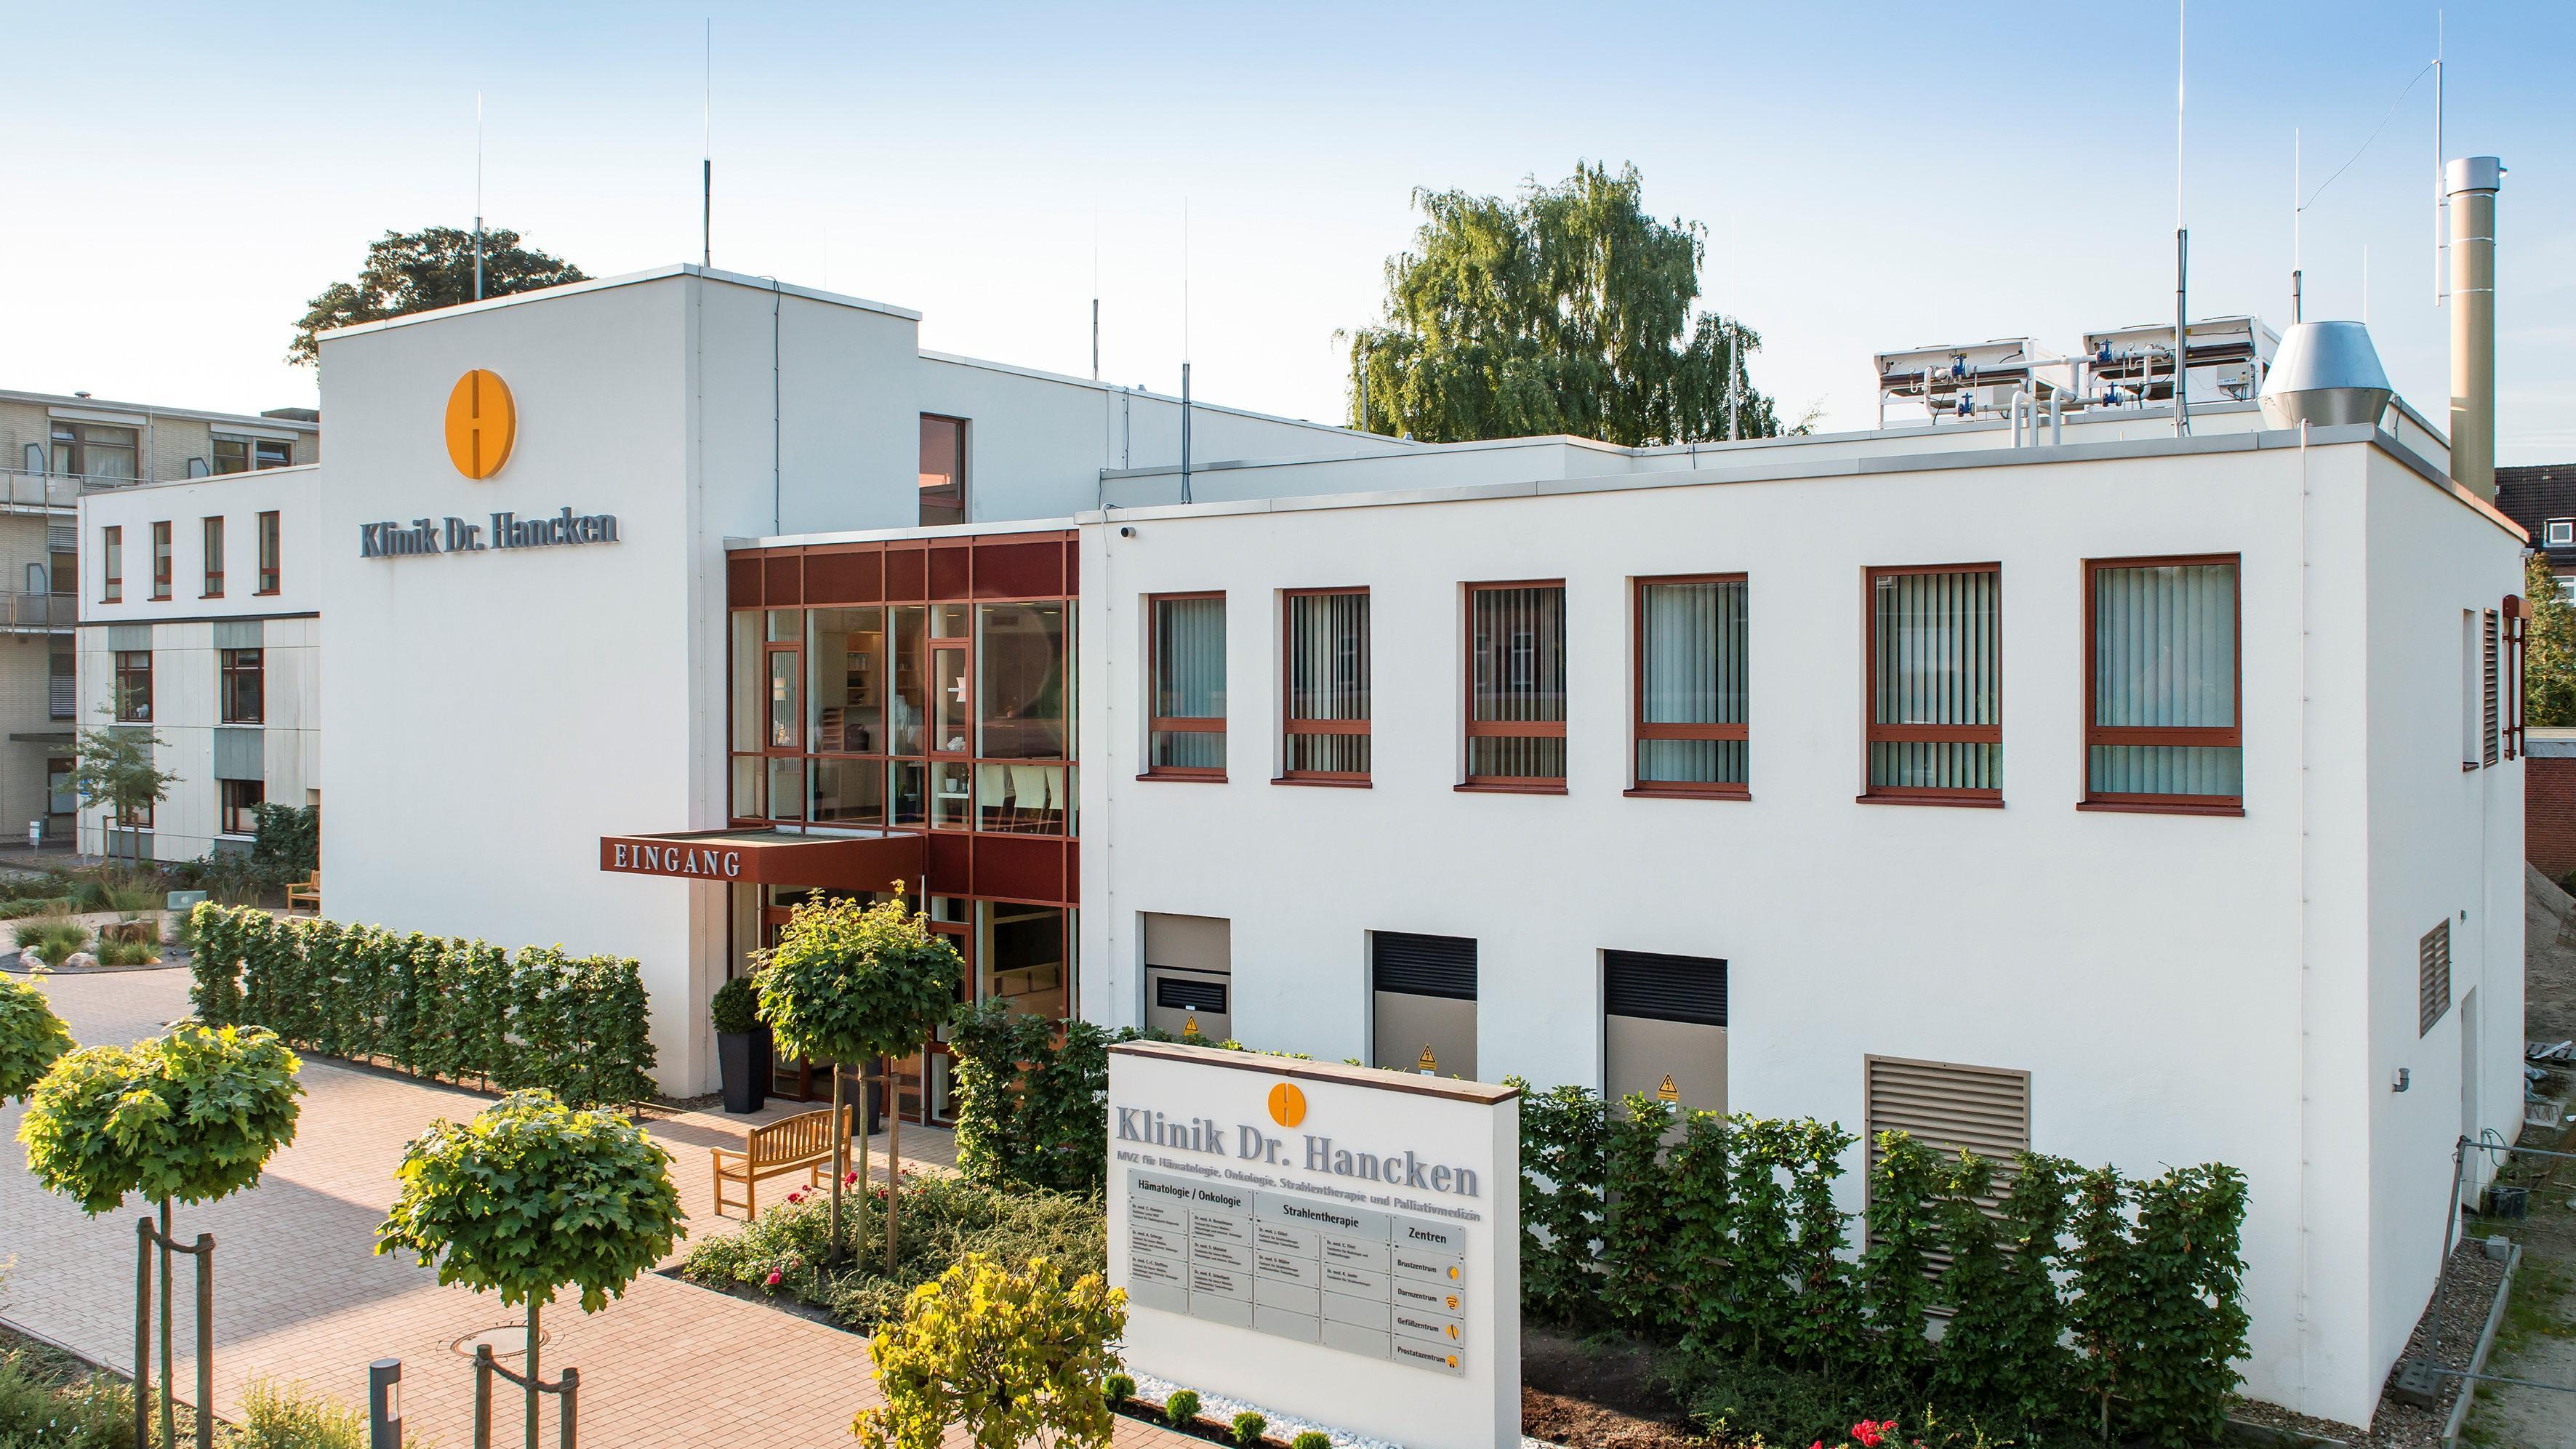 Siemens Healthineers - Klinik Dr. Hancken is securing long-term success and sustainable growth